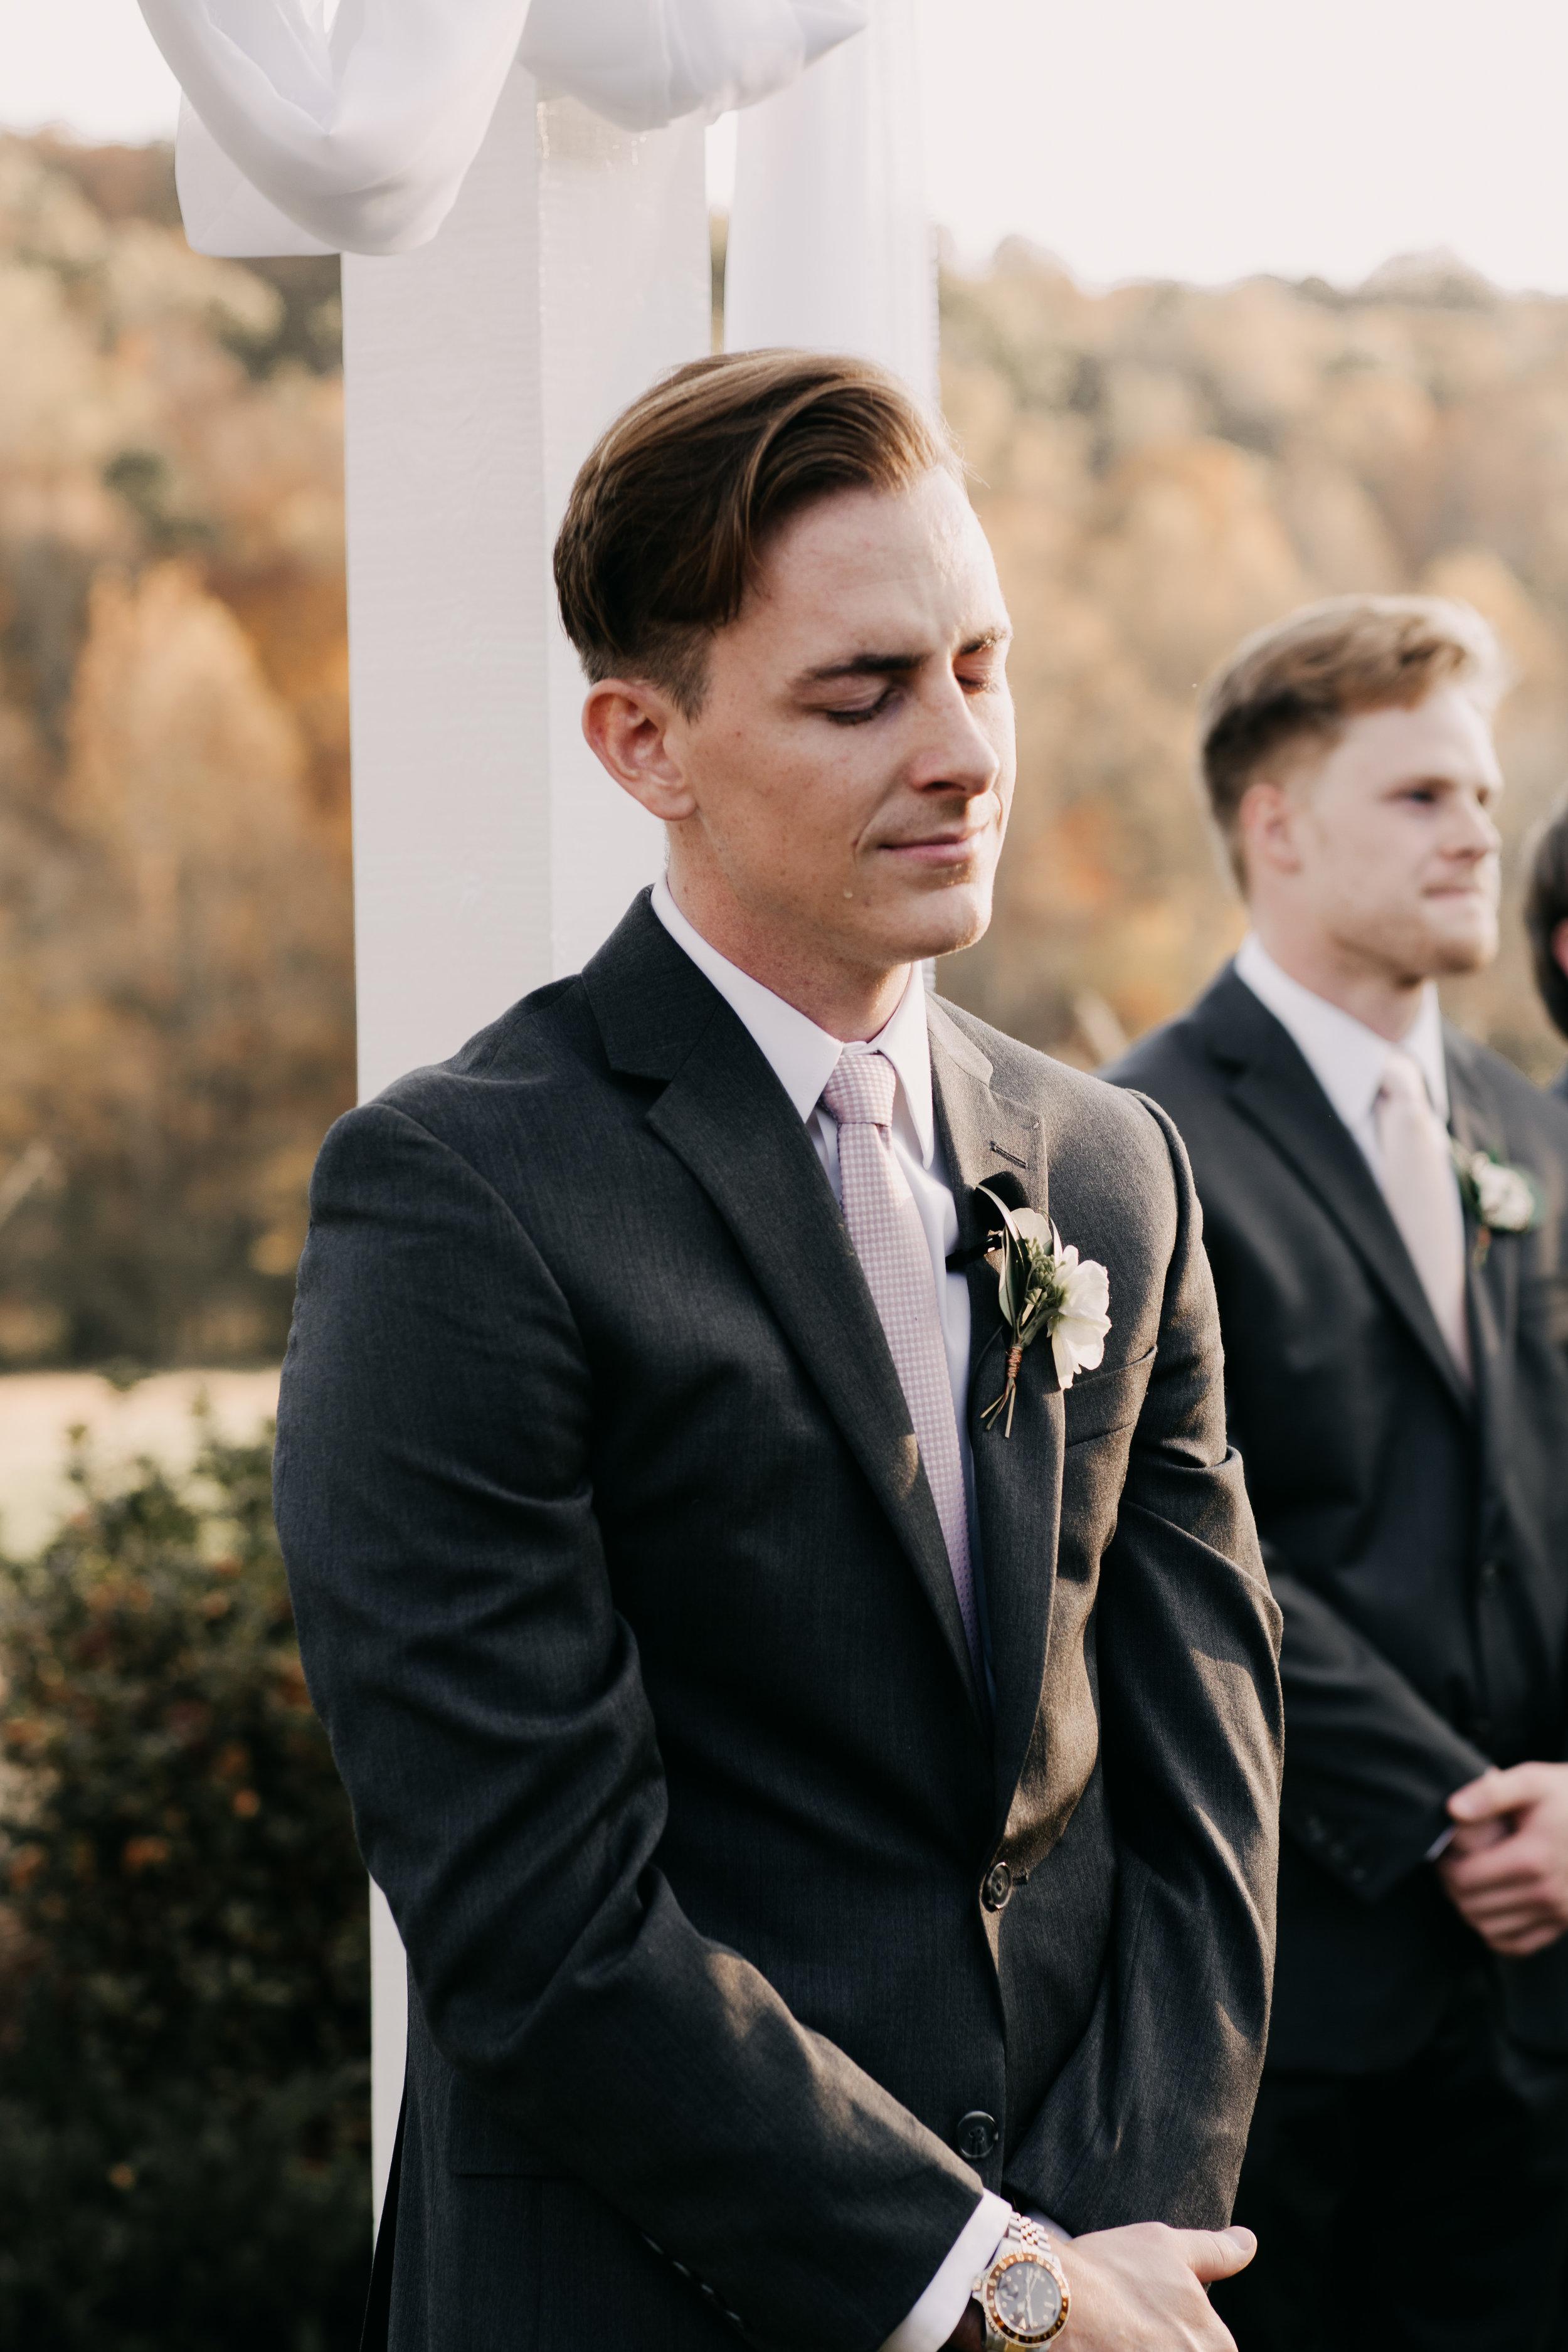 Kaylyn & Ryan Final Wedding Photos316.jpg